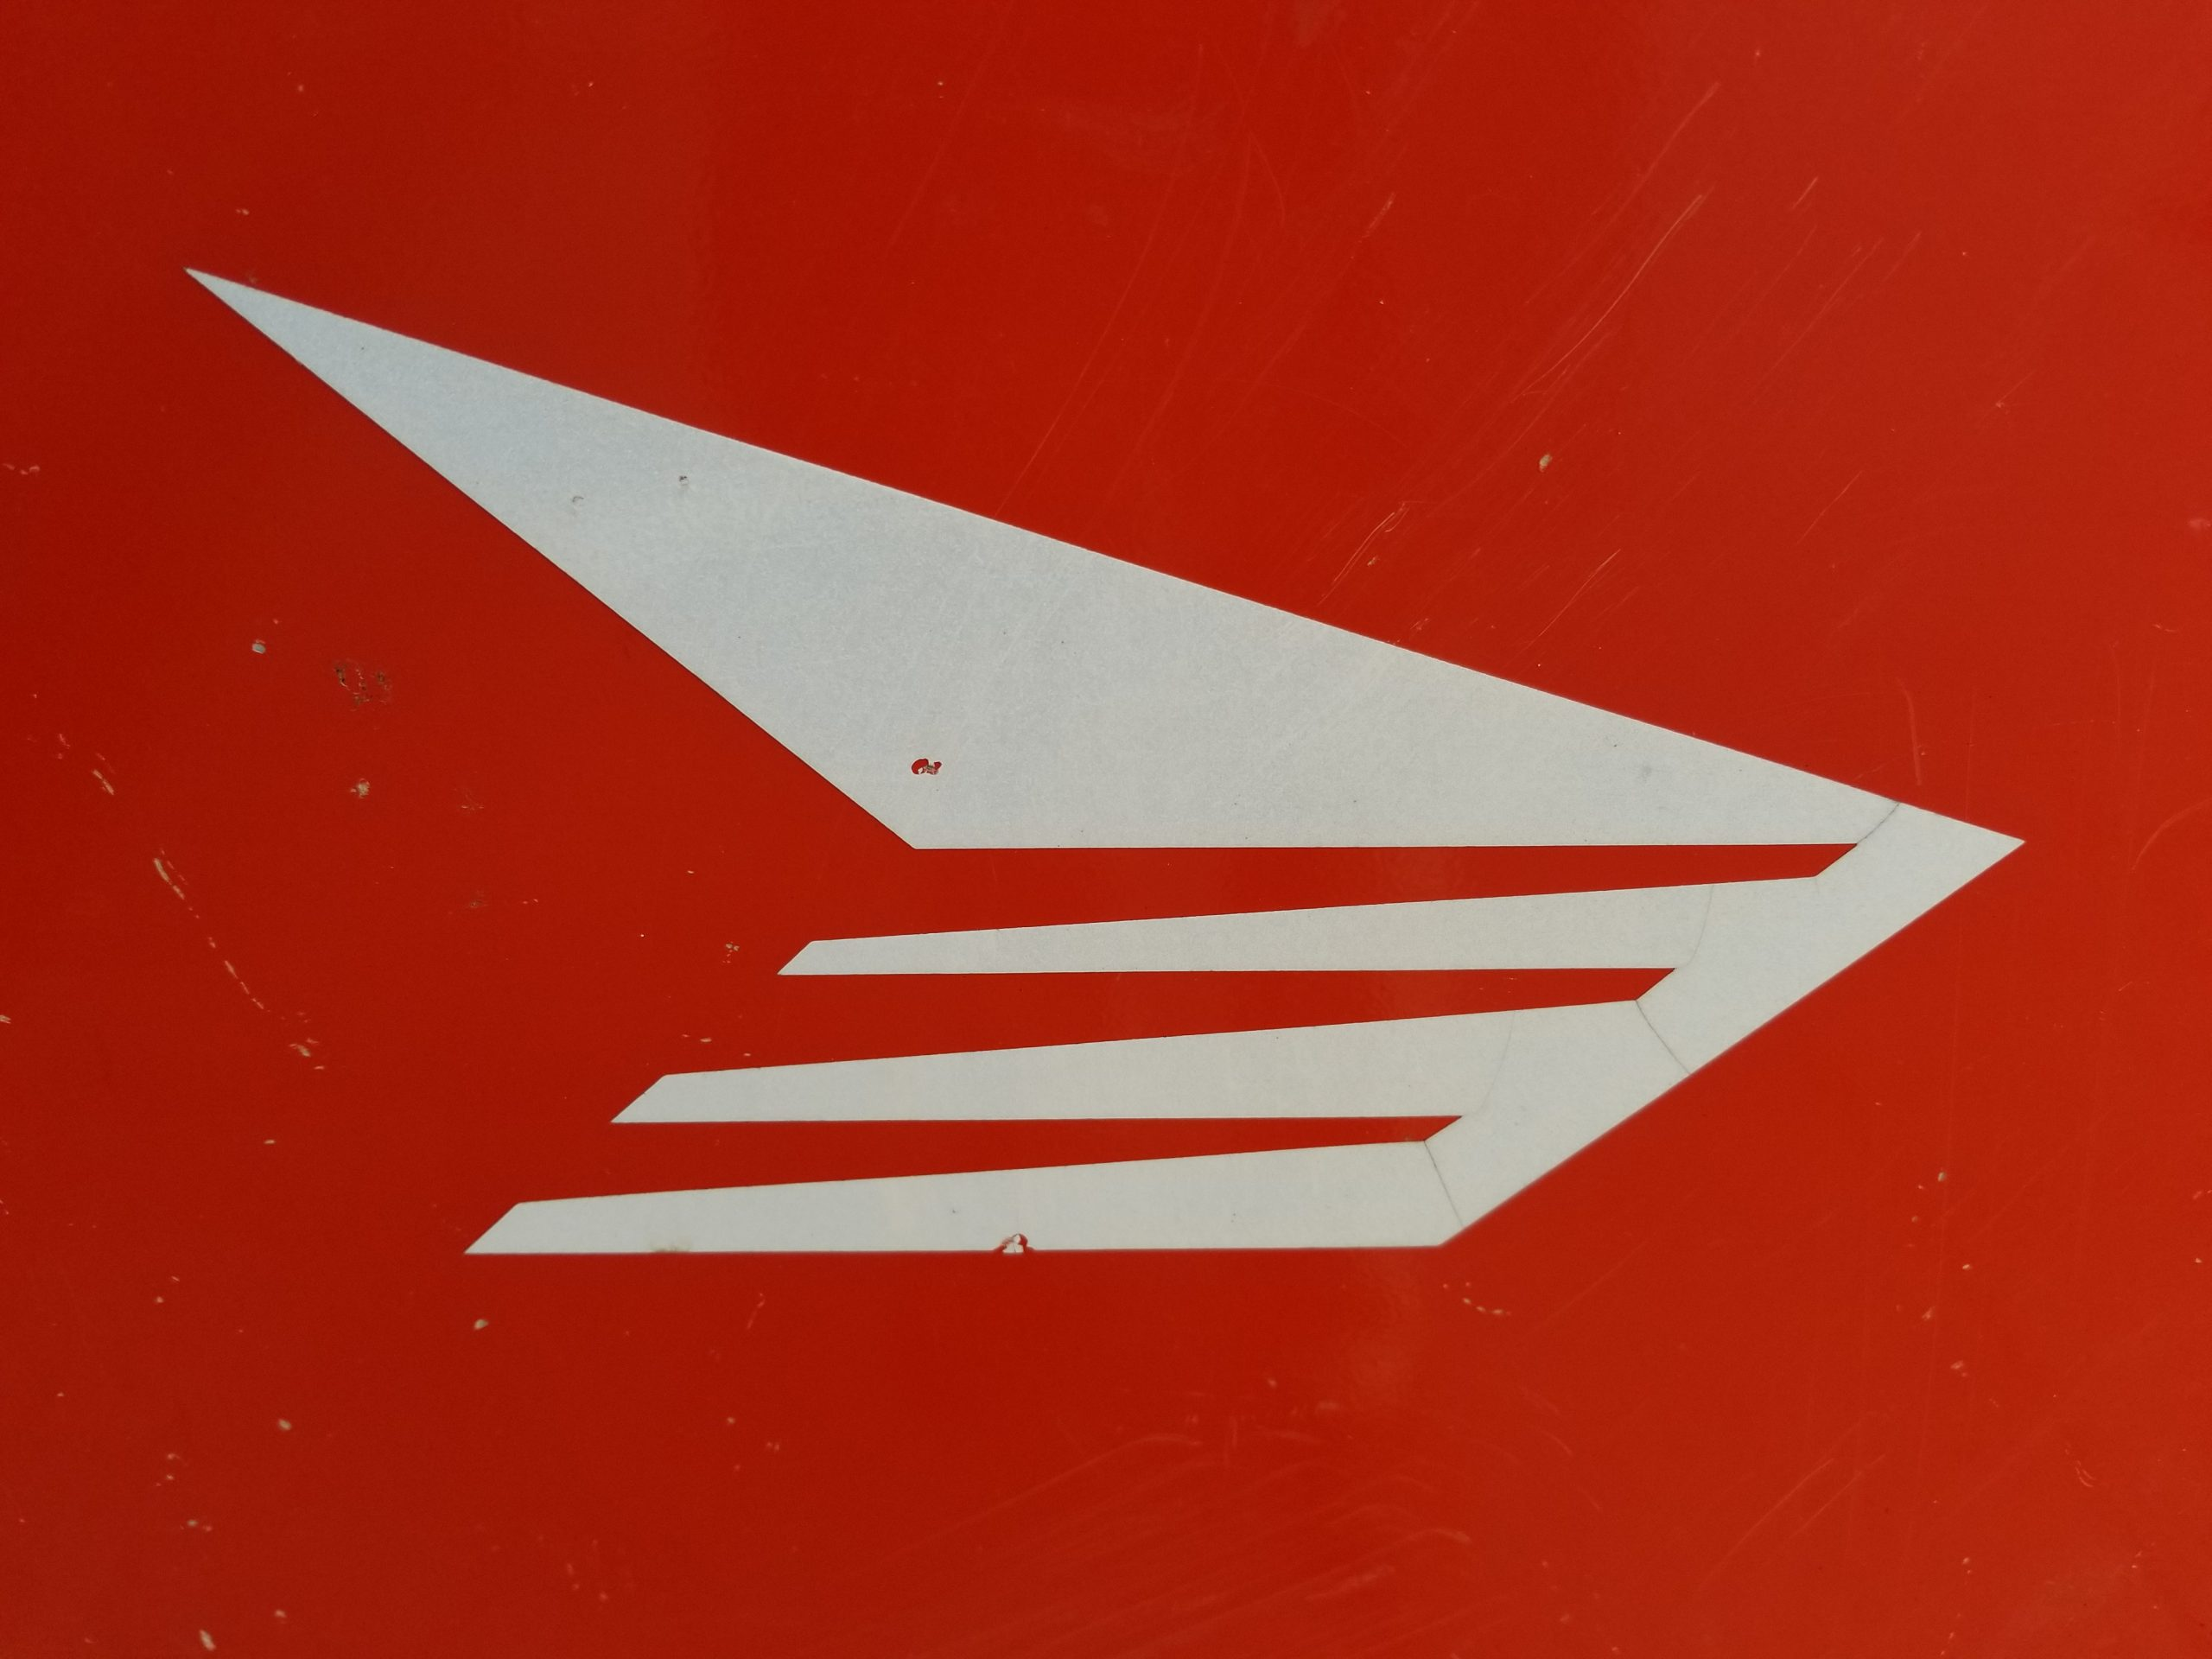 Postal Strike On Hold